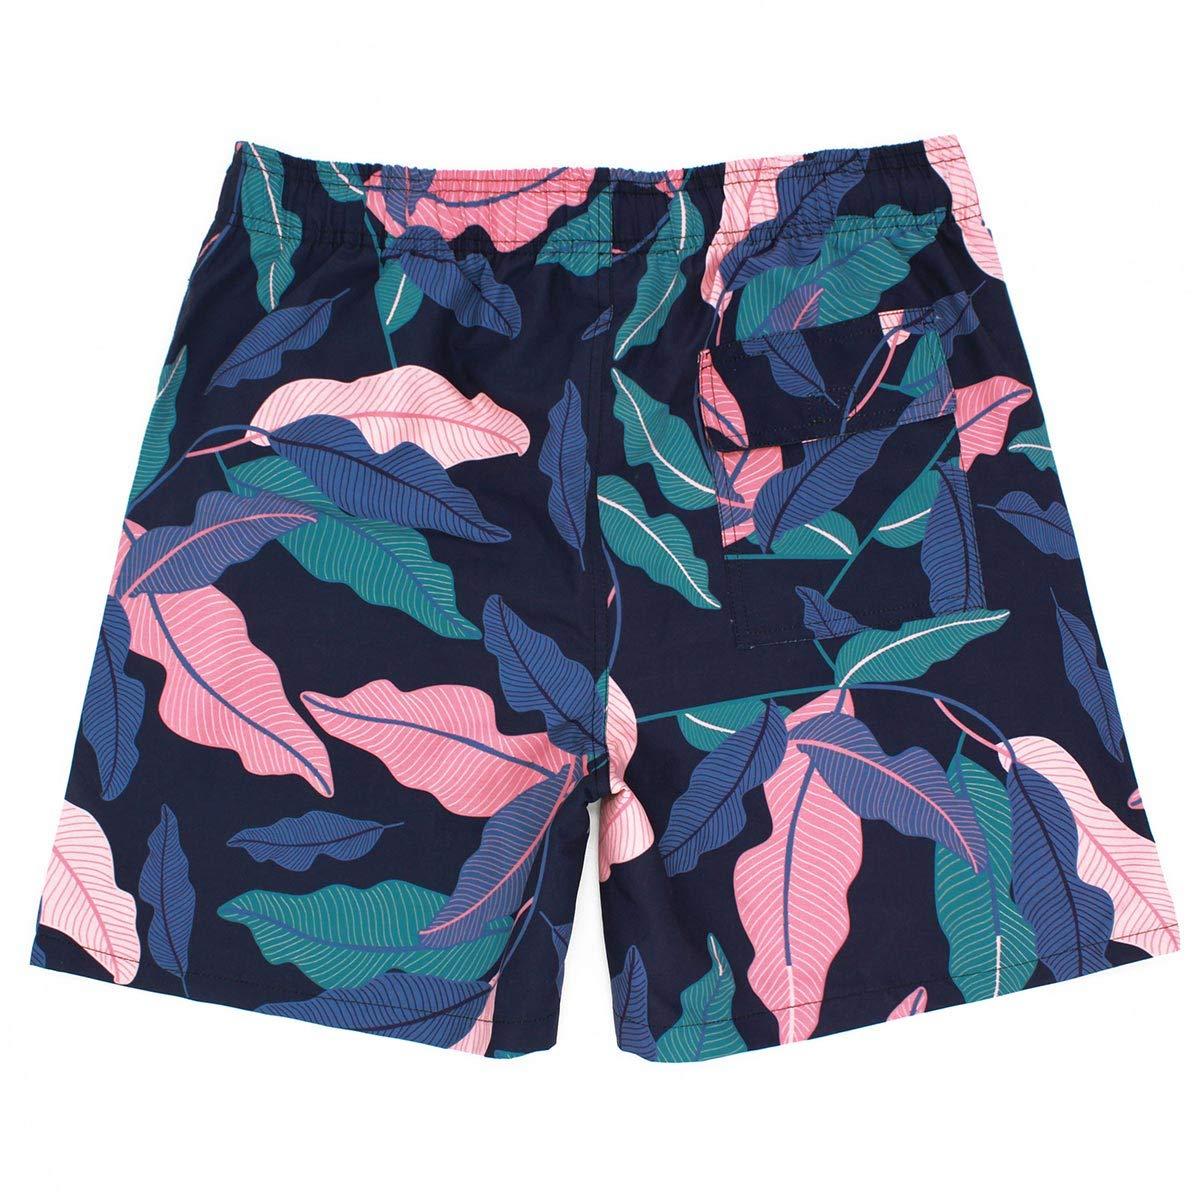 Aivtalk Men Swim Trunks Quick Dry Beach Shorts Adjustable Summer Swimwear